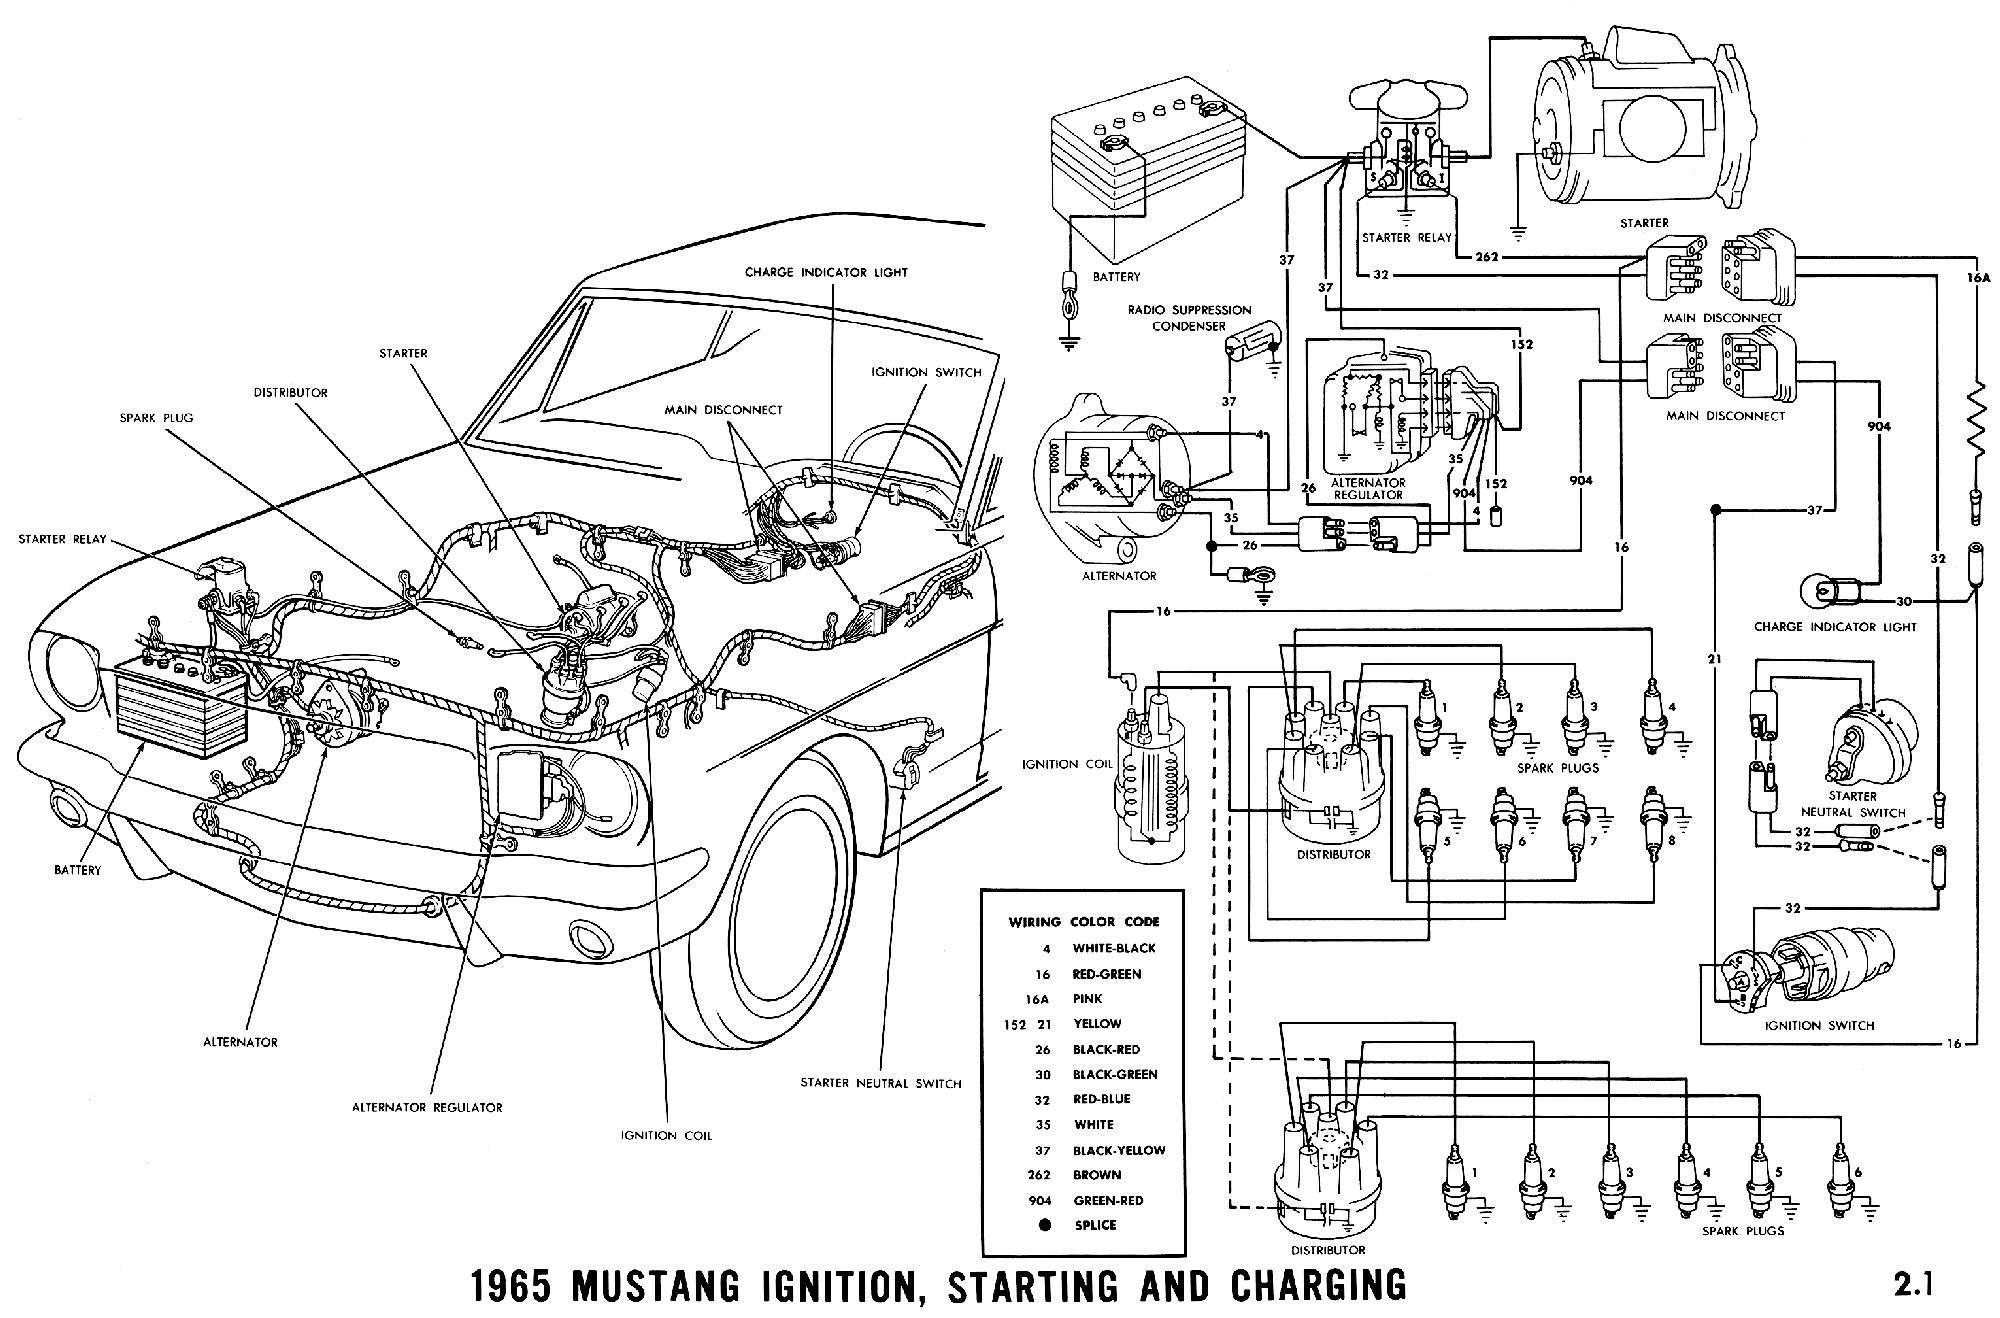 Basic Diagram Of Car Parts 2015 Mustang Engine Diagram Engine Car Parts and Ponent Diagram Of Basic Diagram Of Car Parts